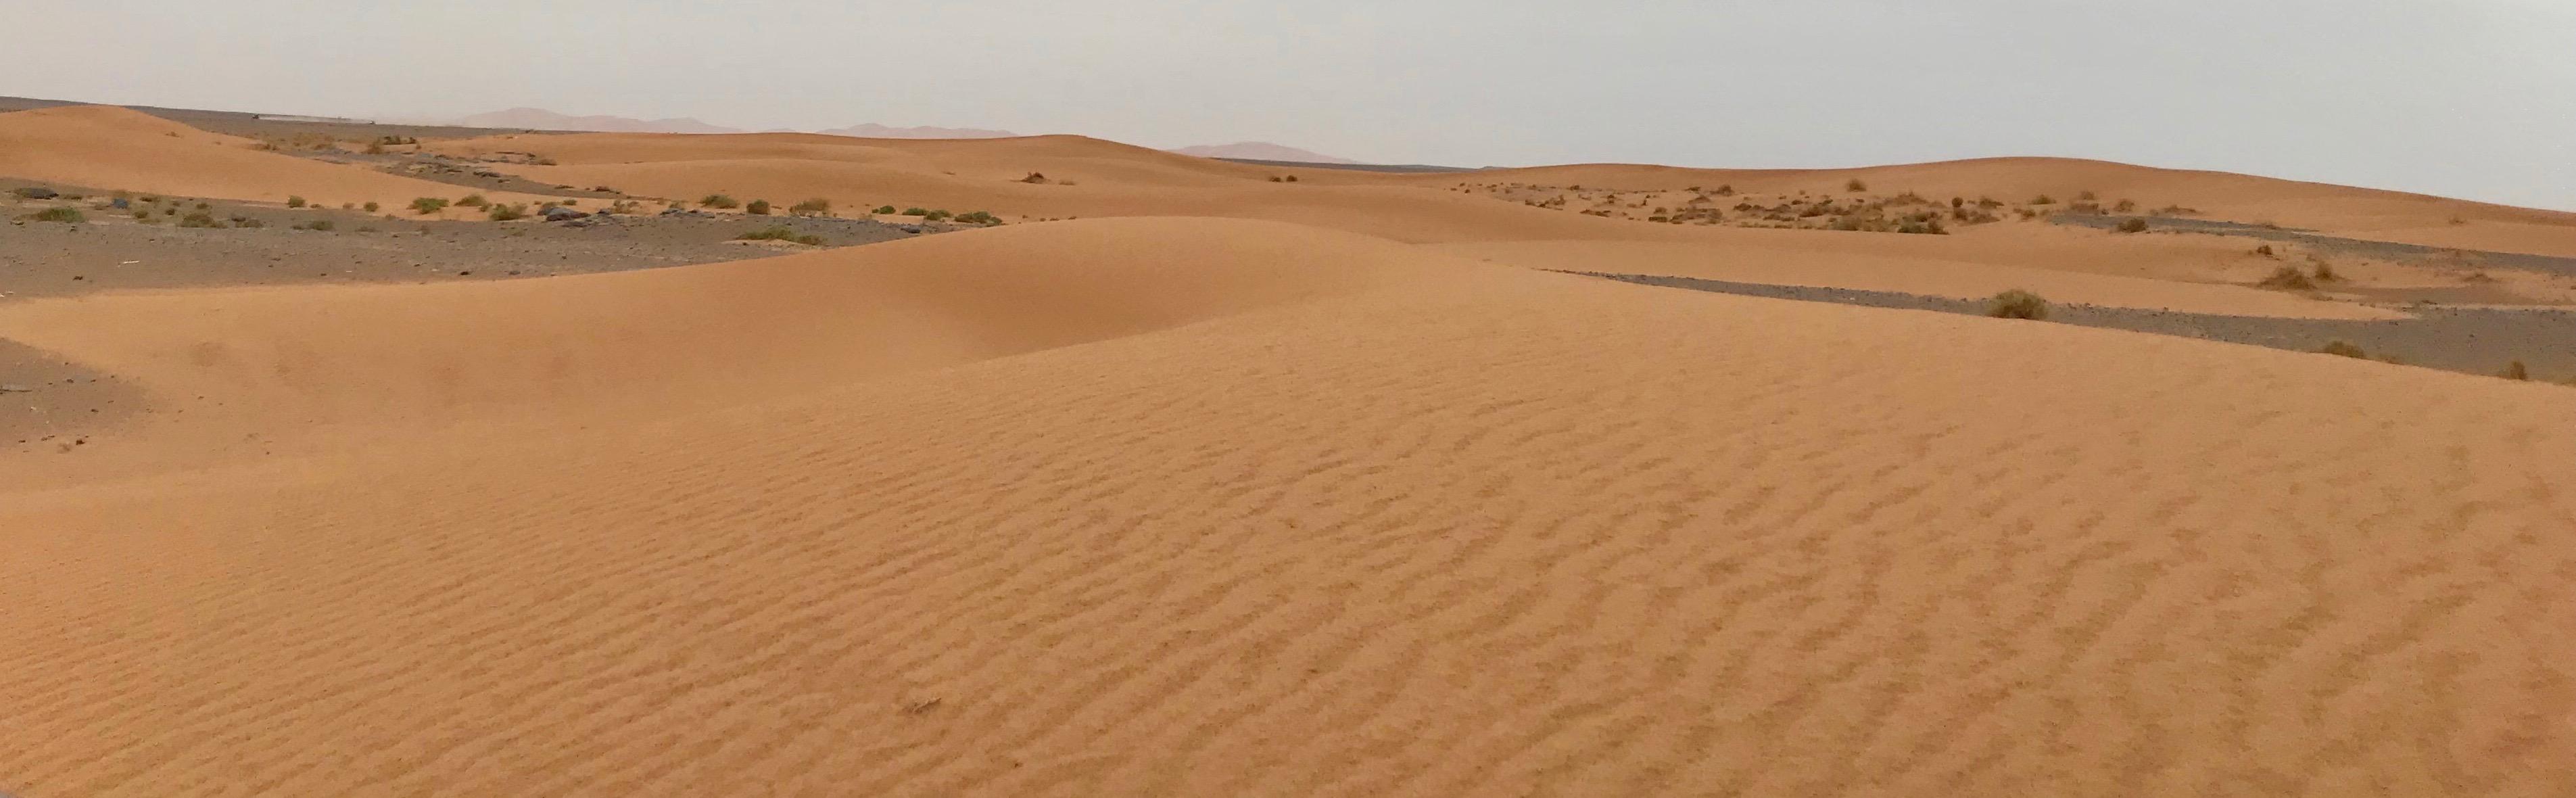 Dunes emerge from gravel base